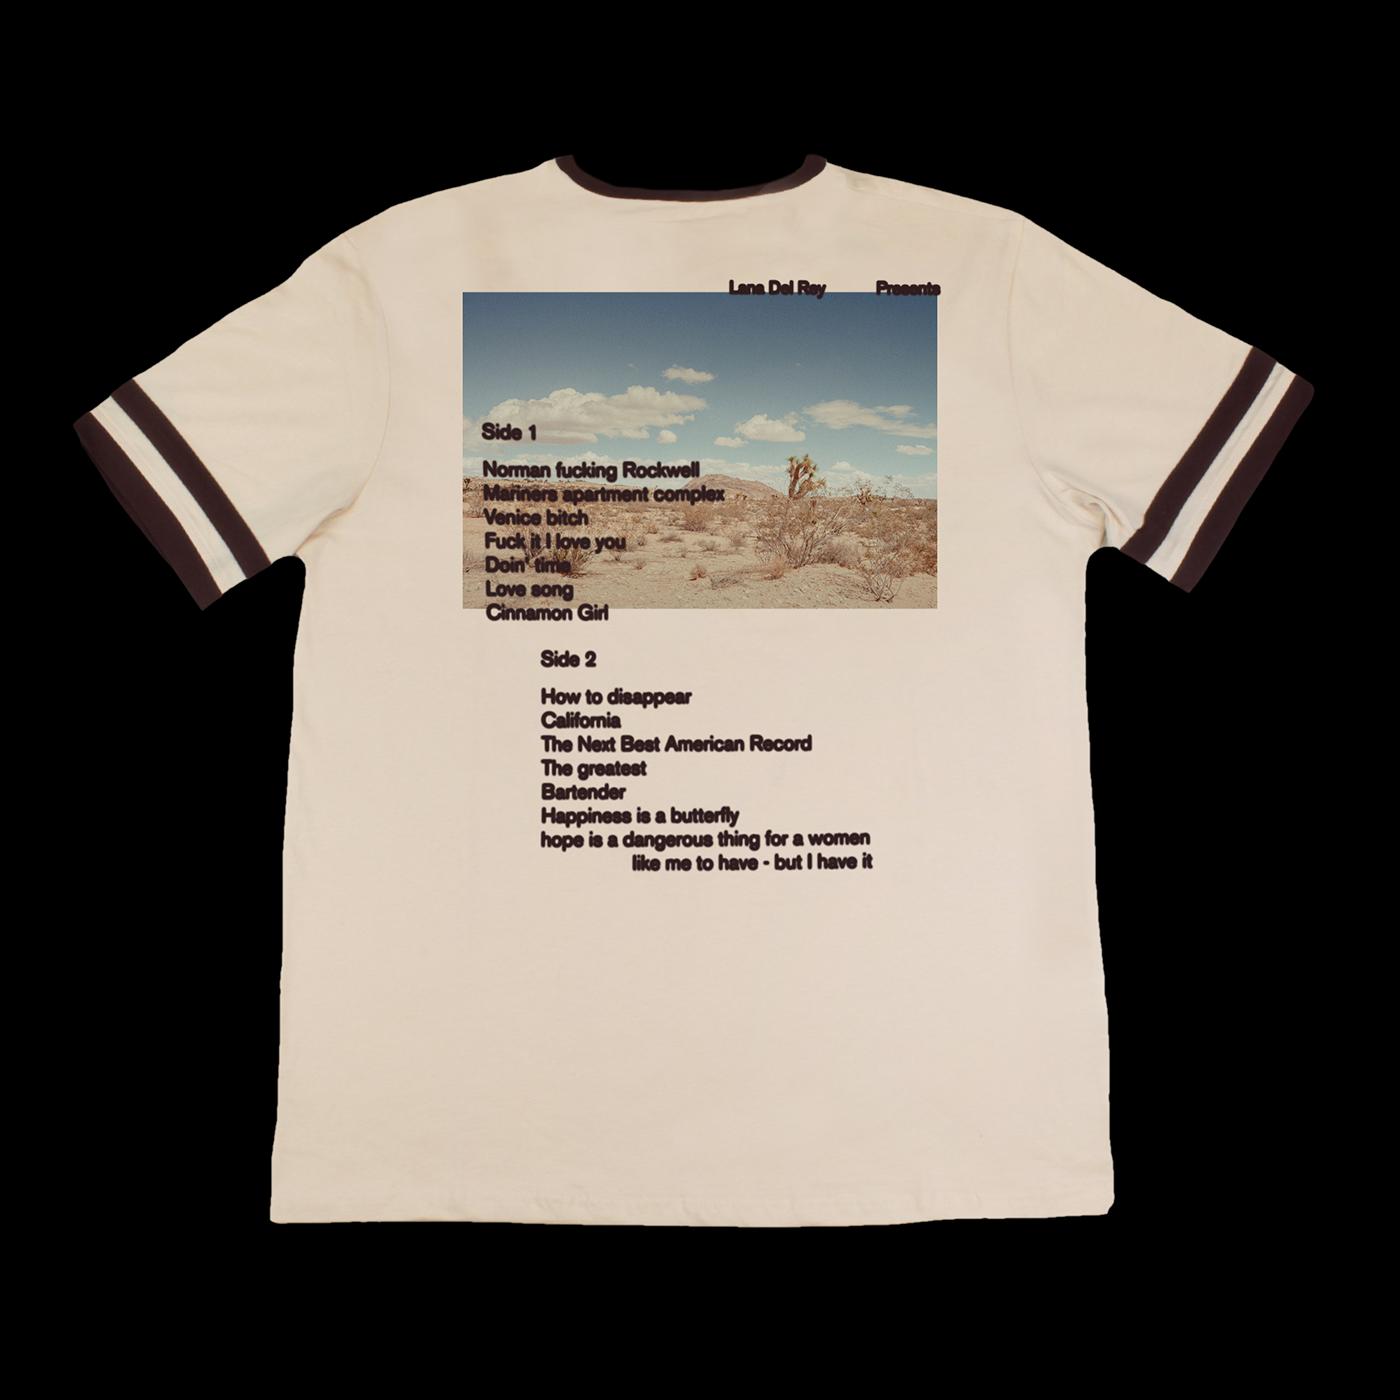 Lana Del Rey Nfr Vinyl Merch On Behance